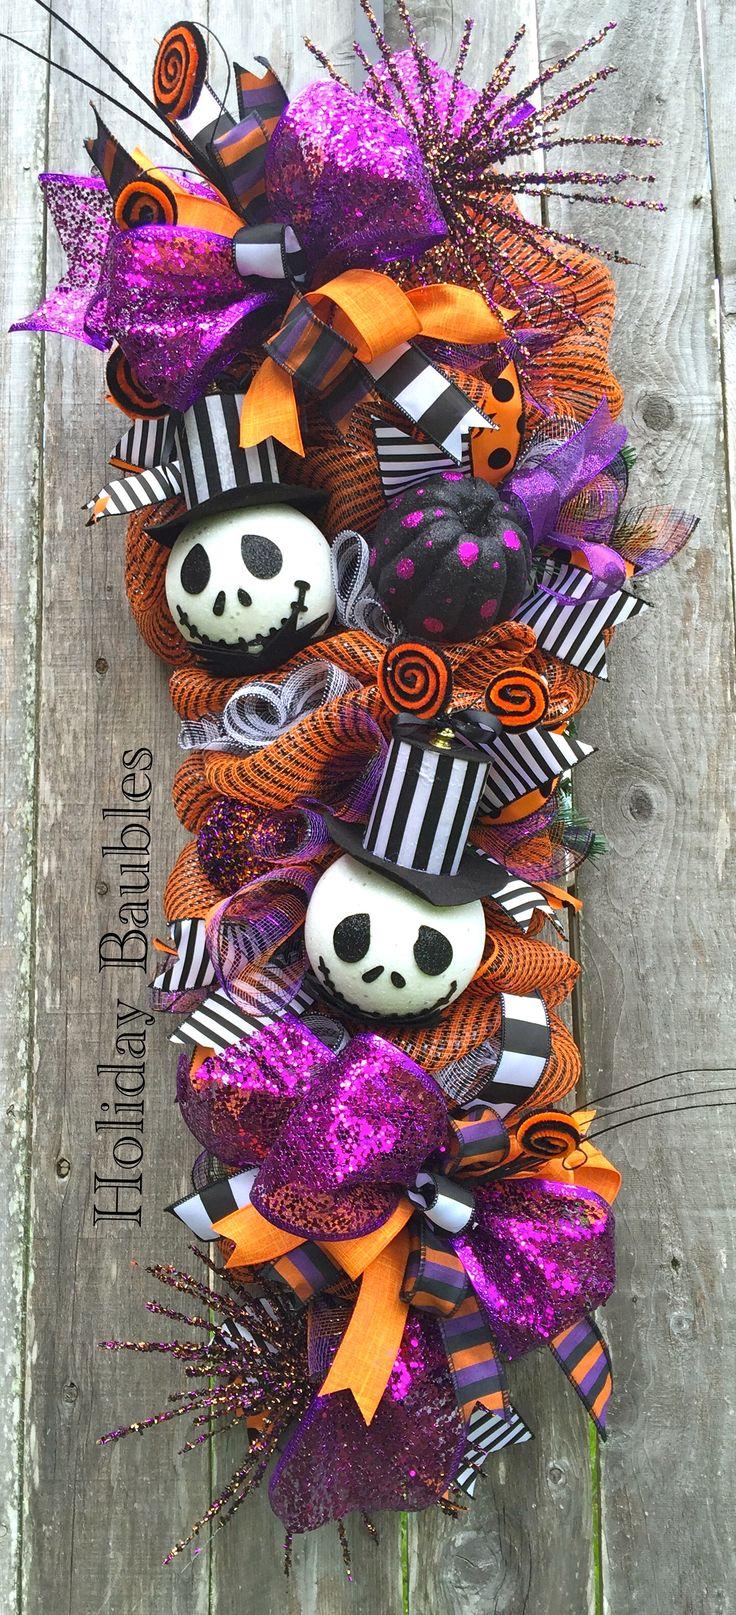 Jack Skellington Decorations Halloween 492 Best Jack Skellington Images On Pinterest